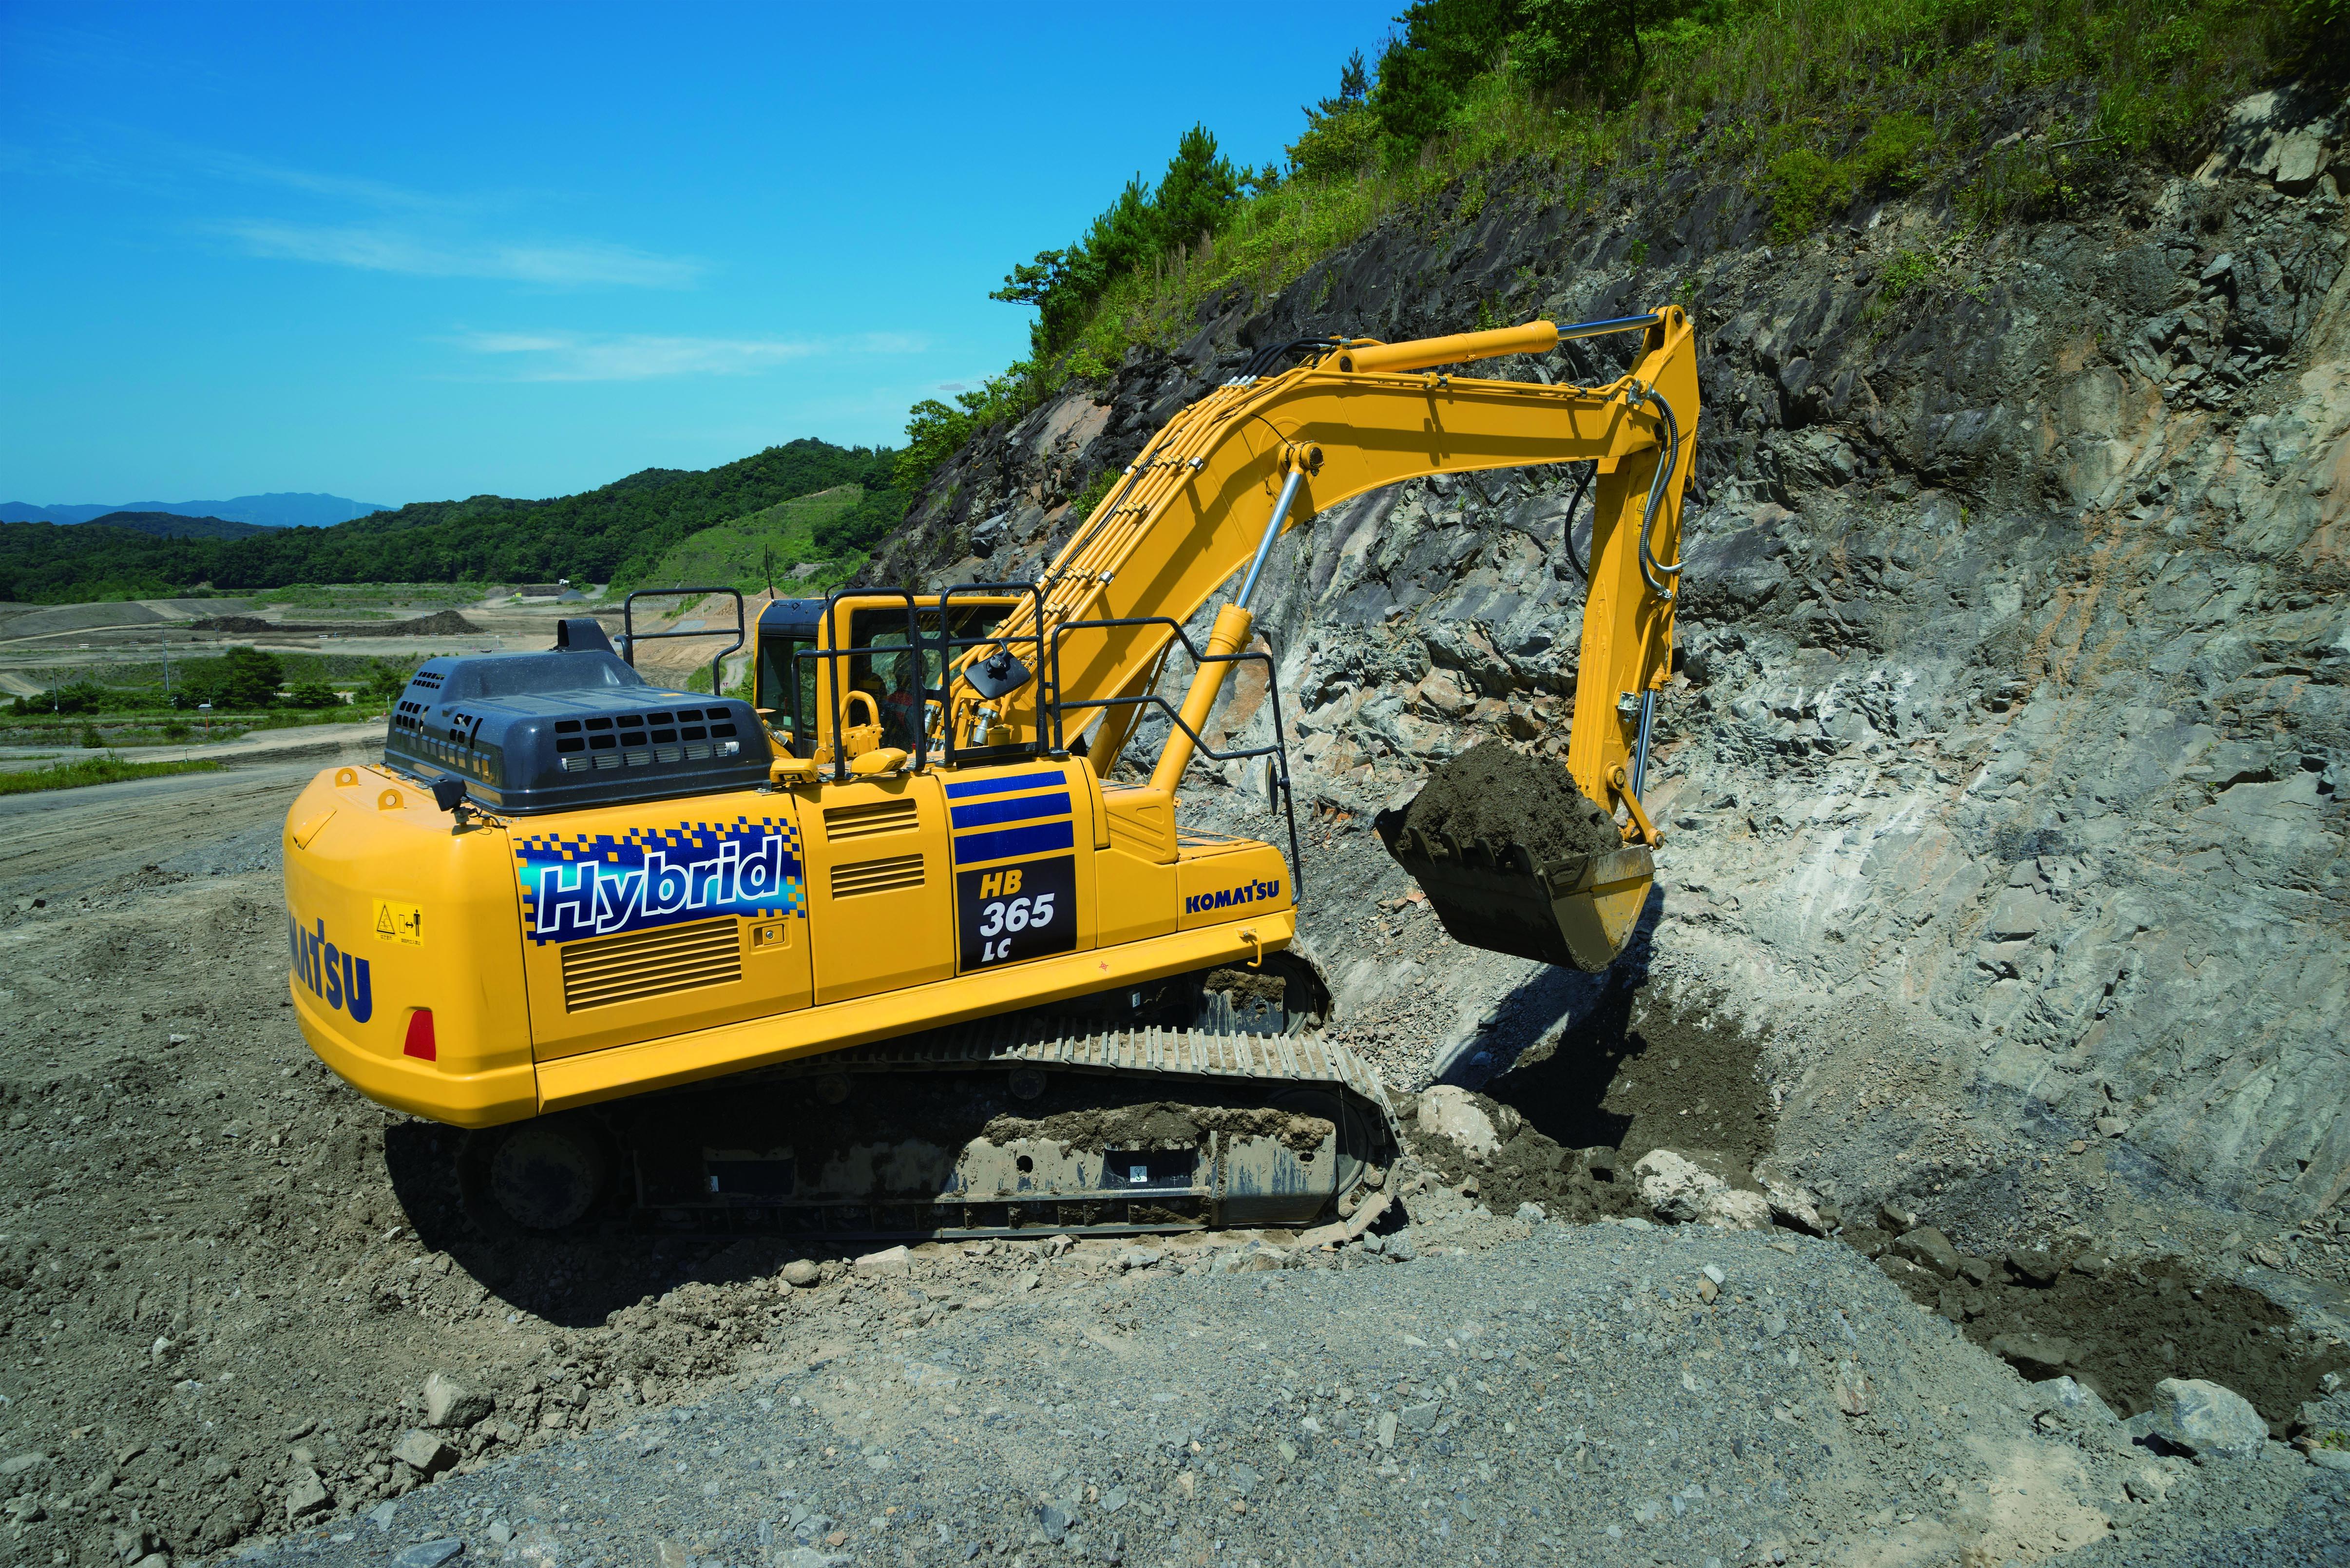 Komatsu HB365LC/NLC‐3 Hybrid Excavator